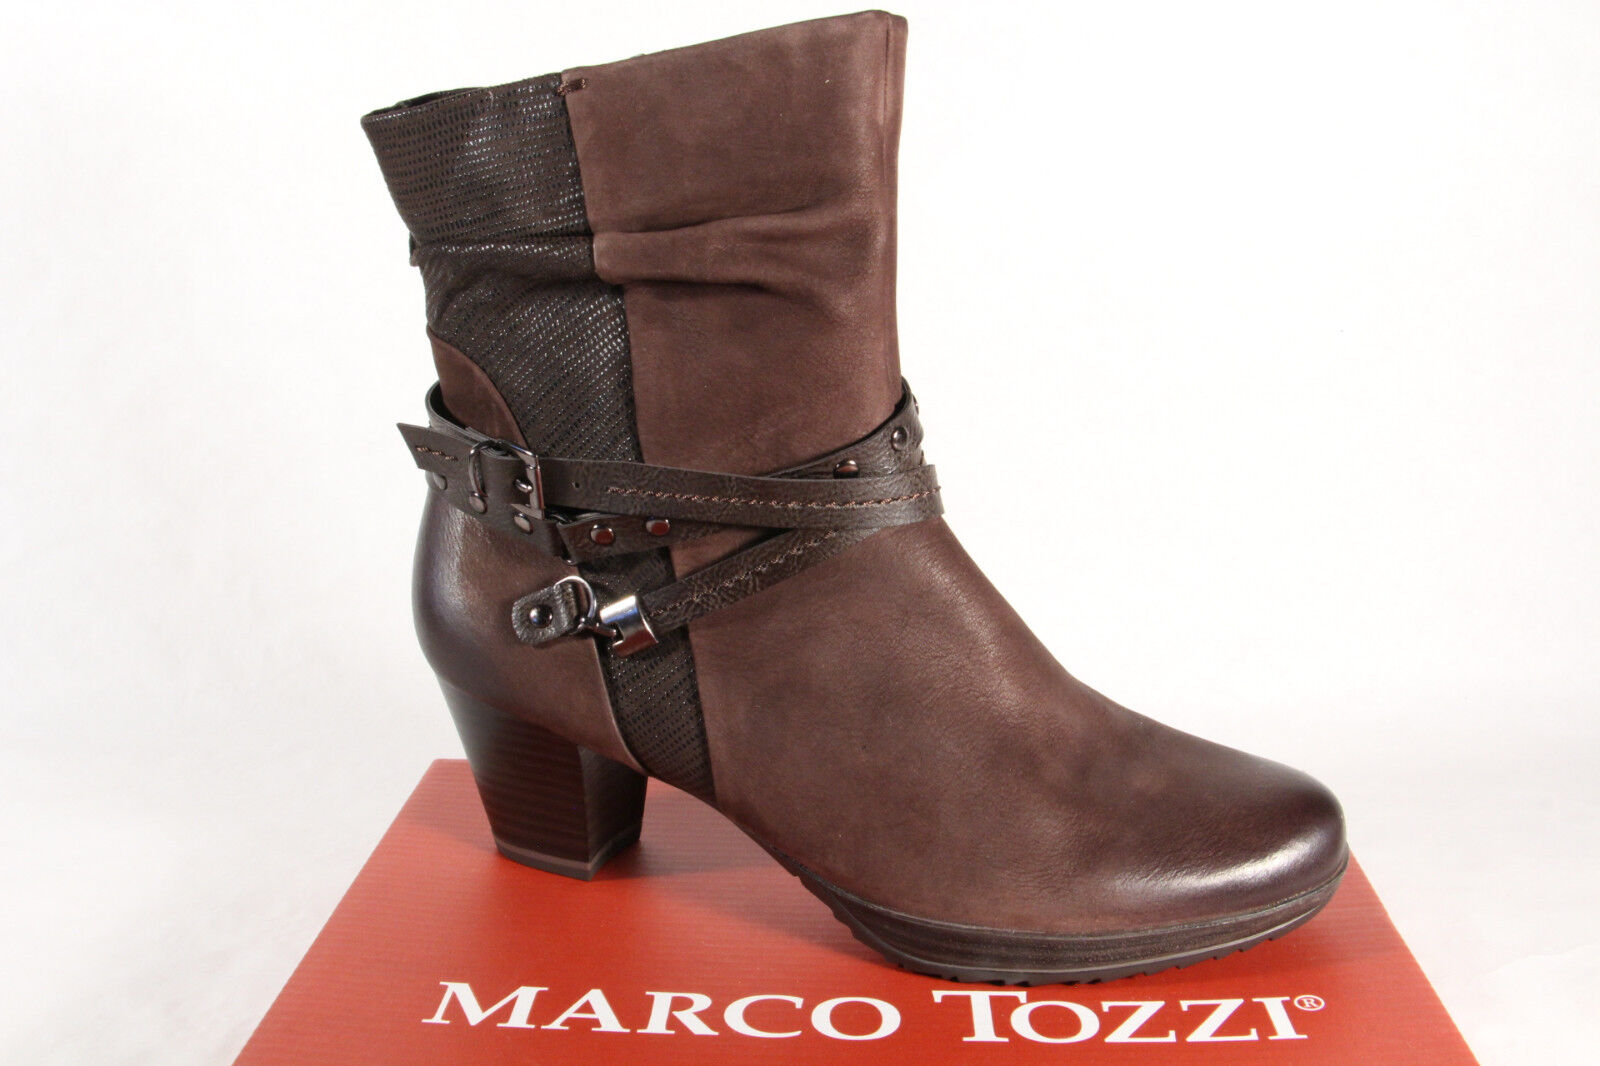 brand new 6063a 5a3a8 Marco Tozzi Damen Stiefel 25421 Stiefelette Boots Echtleder braun NEU!